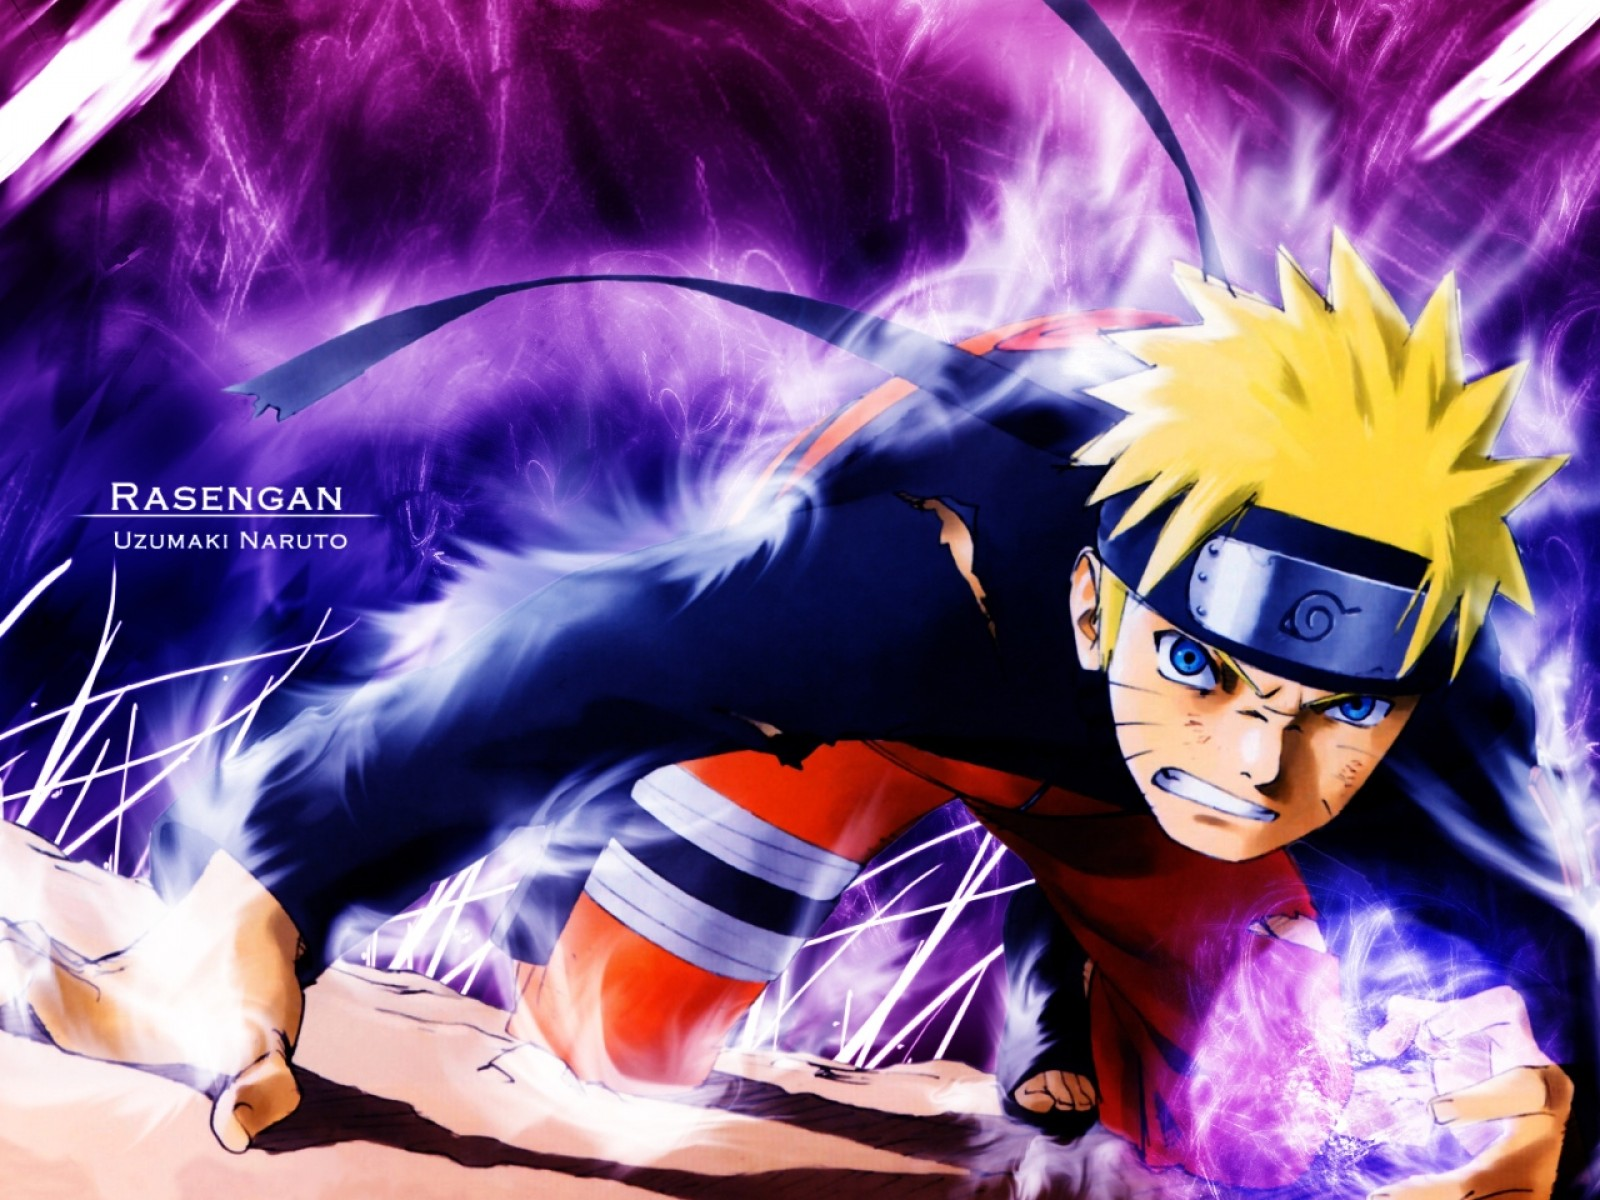 40 Hd Wallpaper Naruto Shippuden 3d: Anime Wallpaper Hd Naruto